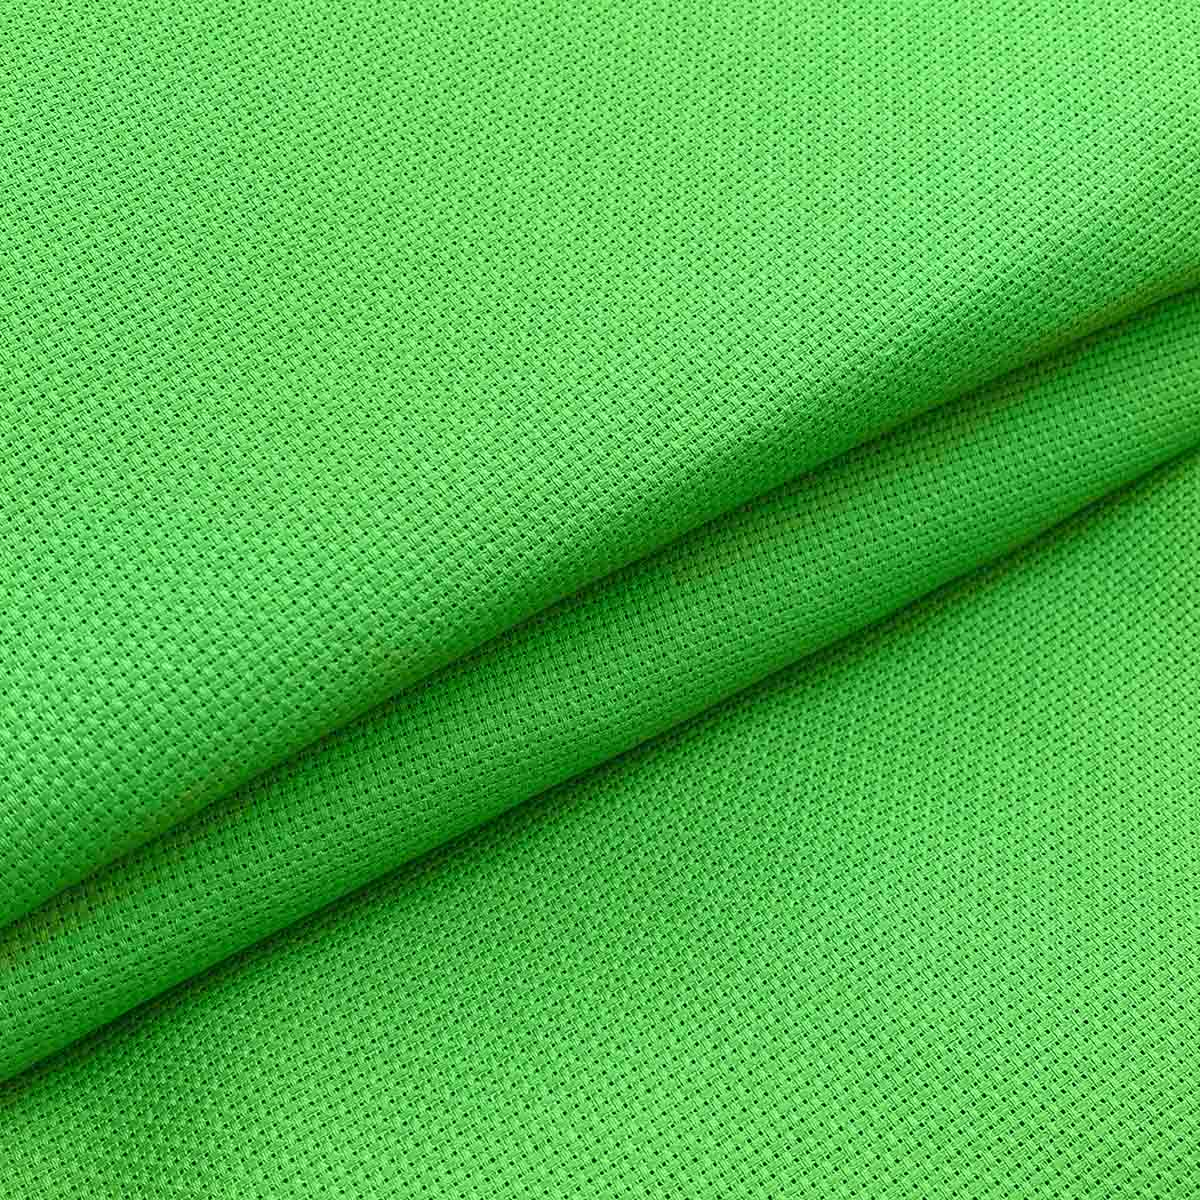 Канва 624010-14C/T 150см*5м цветная Bestex